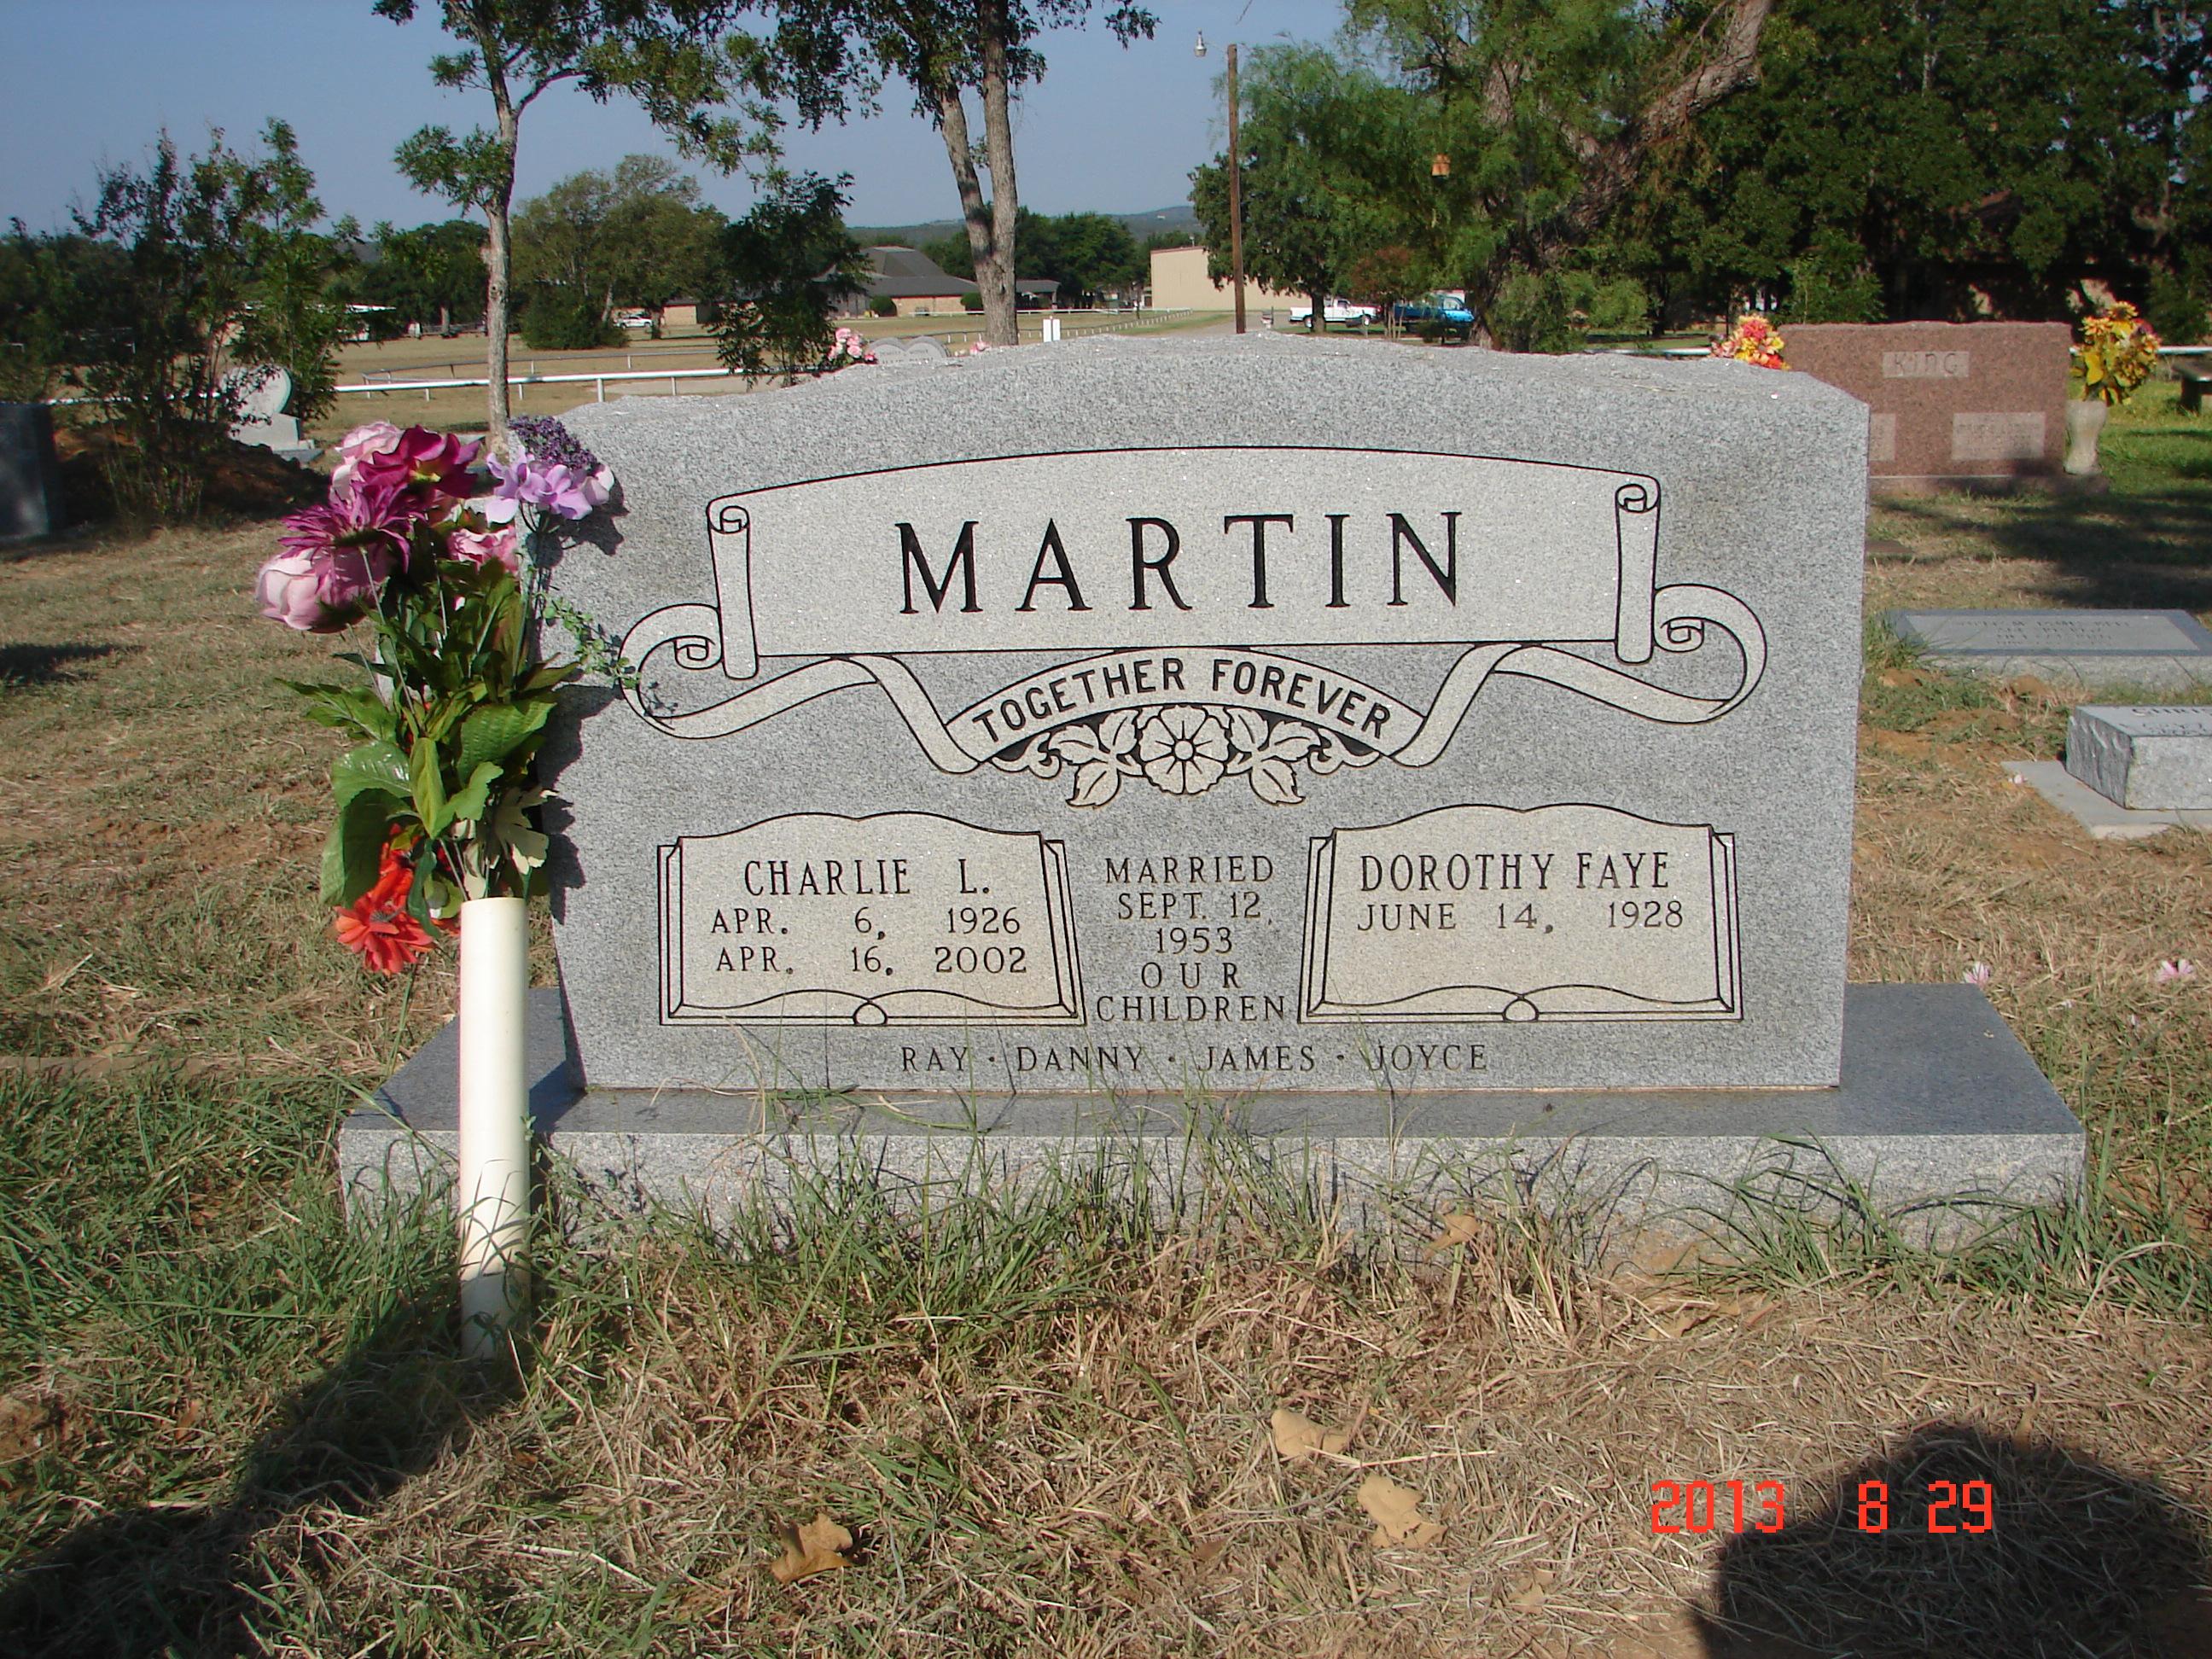 Charlie L Martin